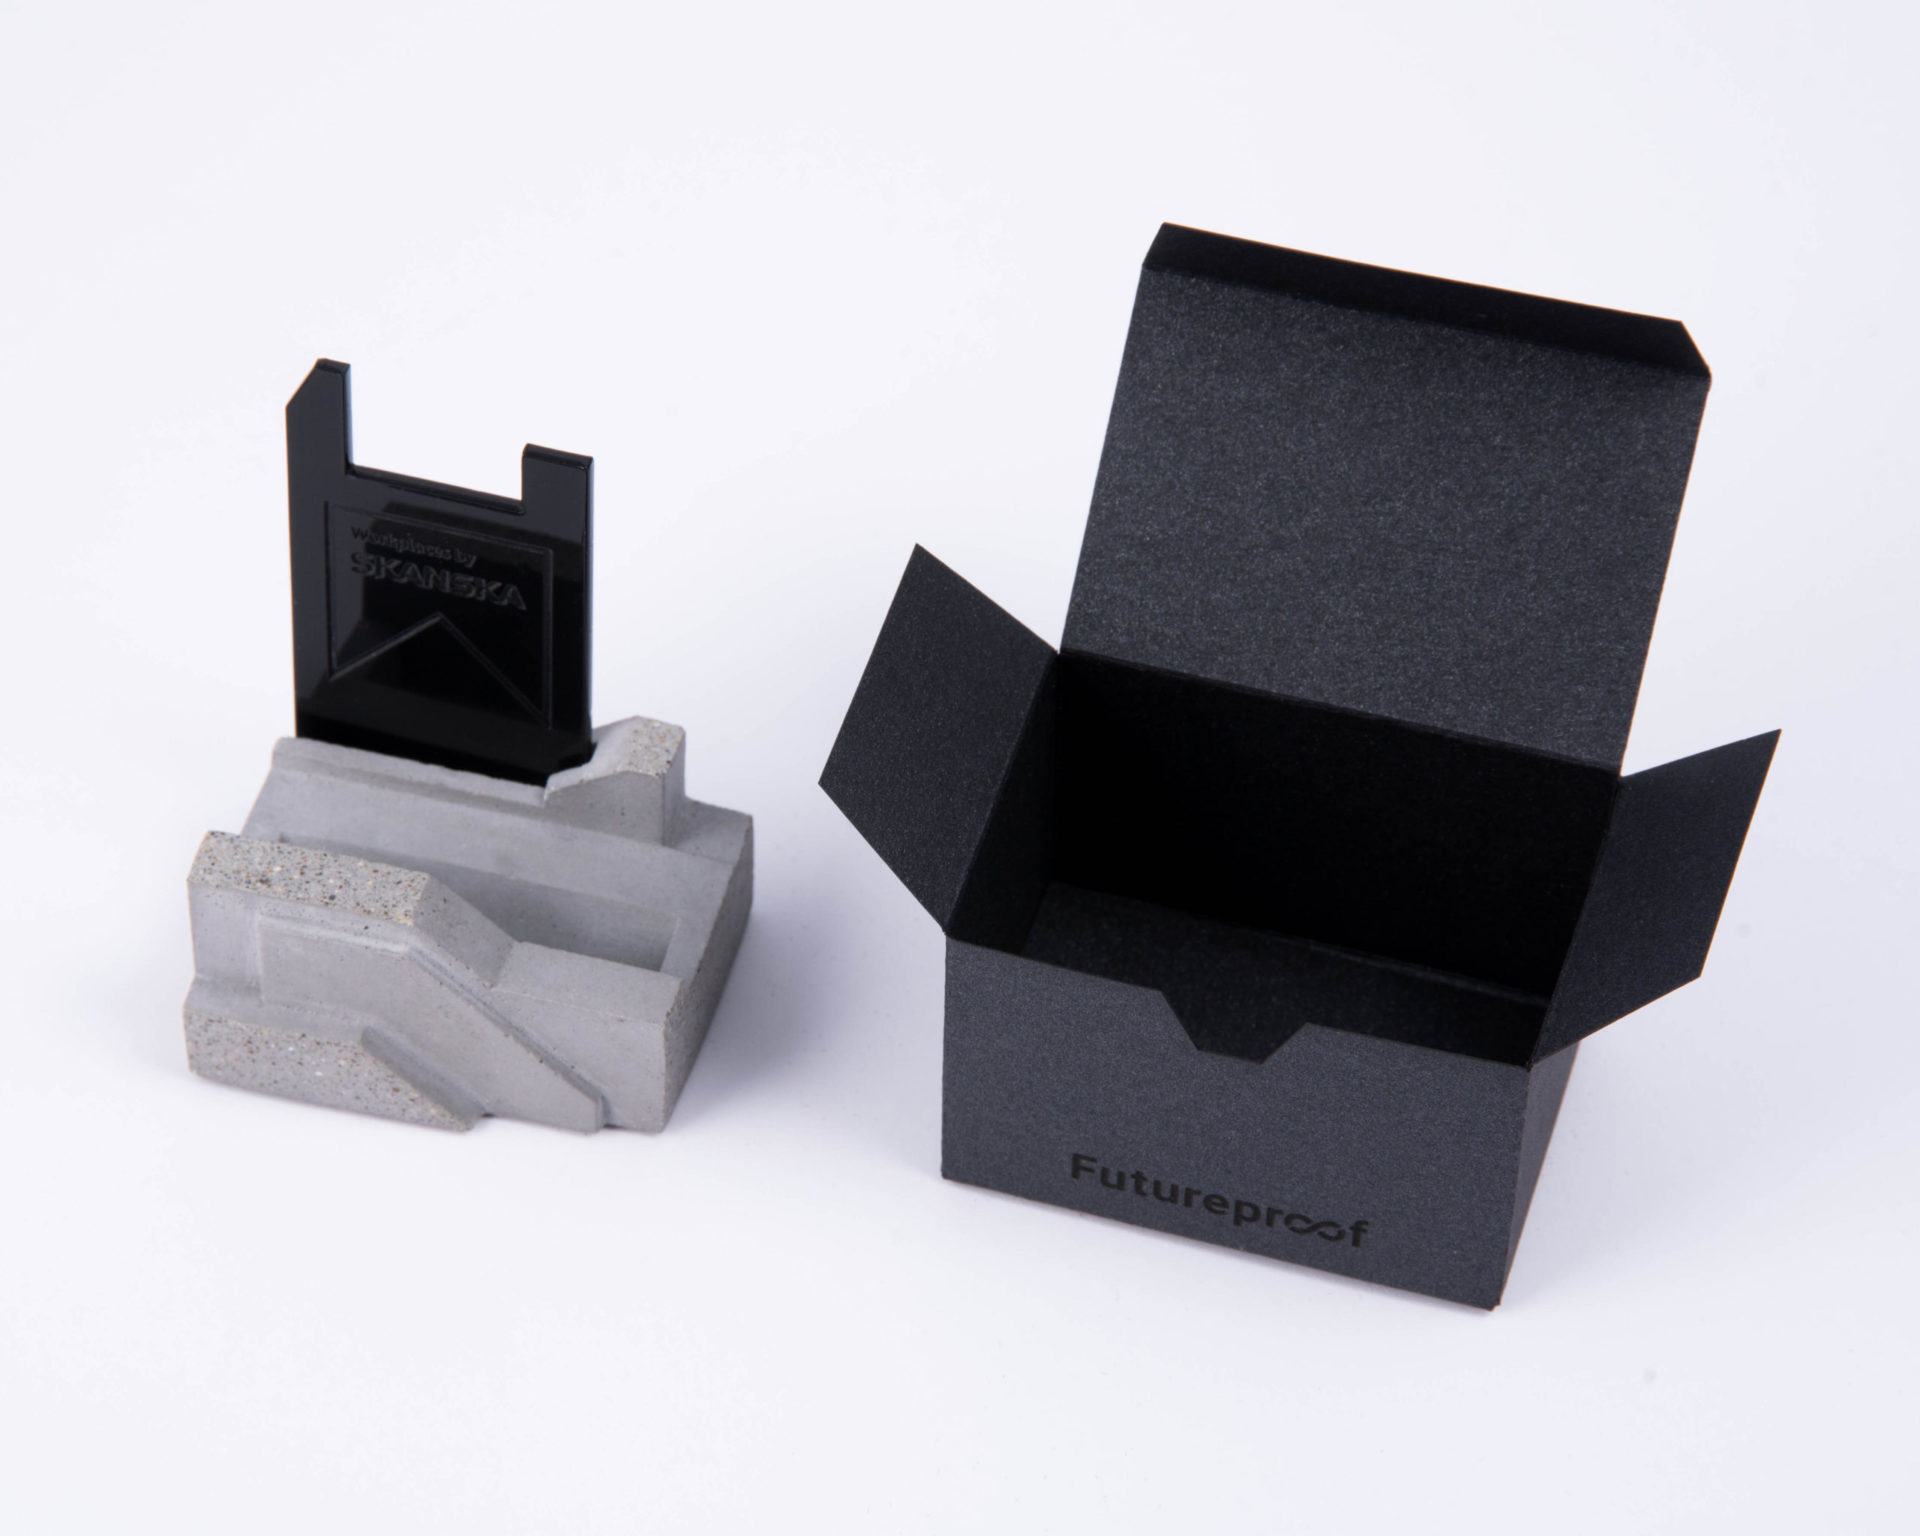 Branded concrete corporate gift customized for Skanska